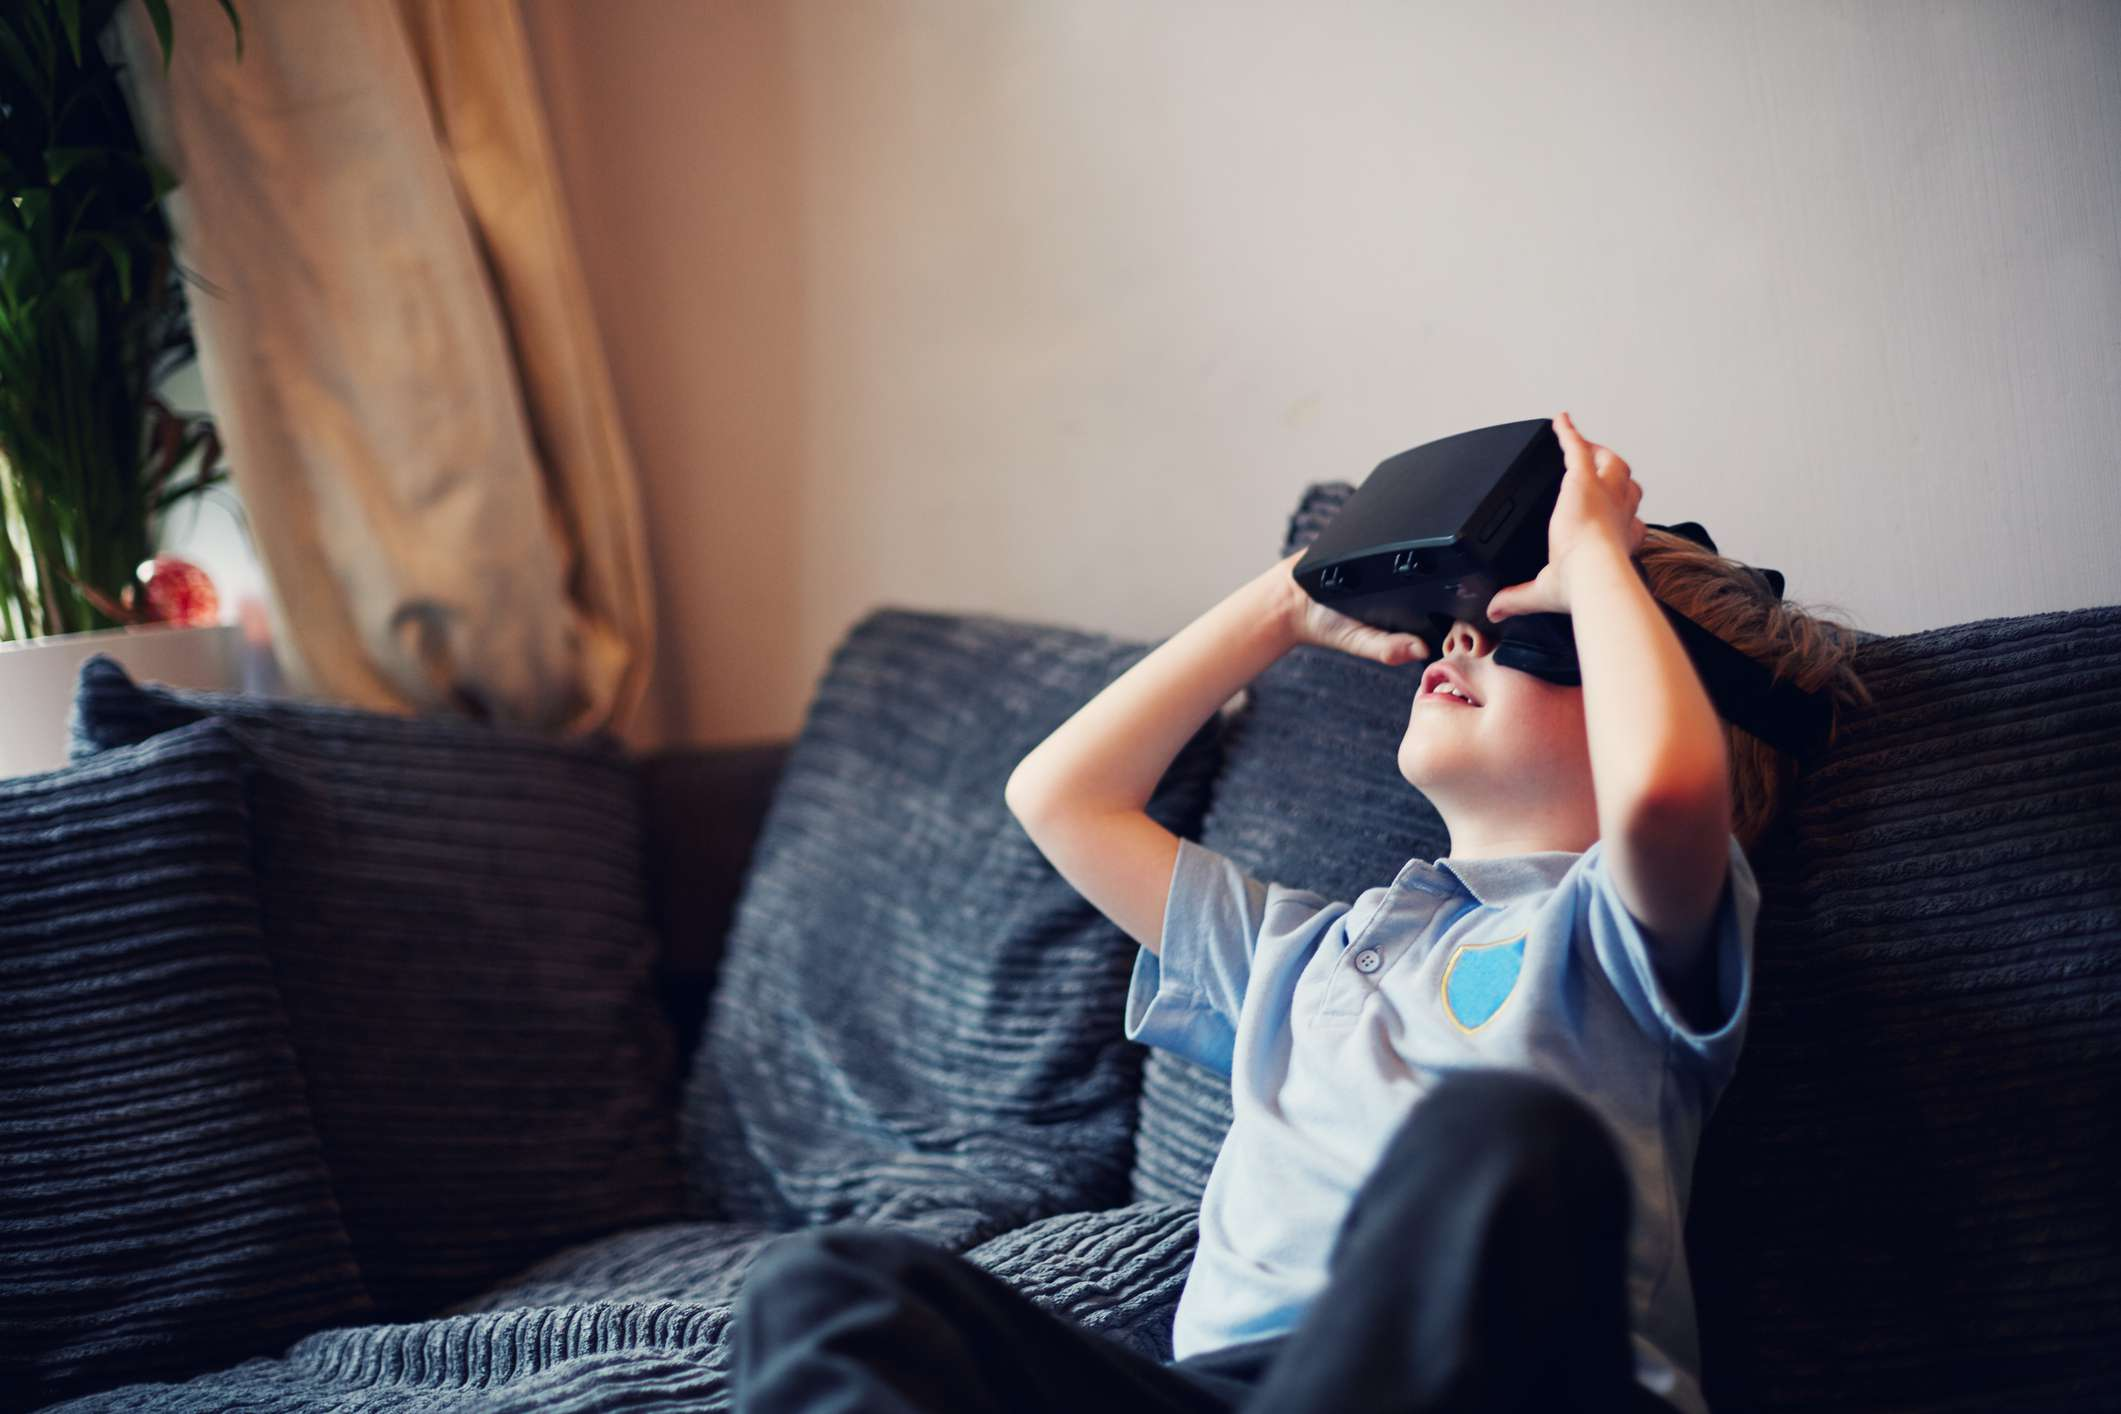 Child wearing VR headset